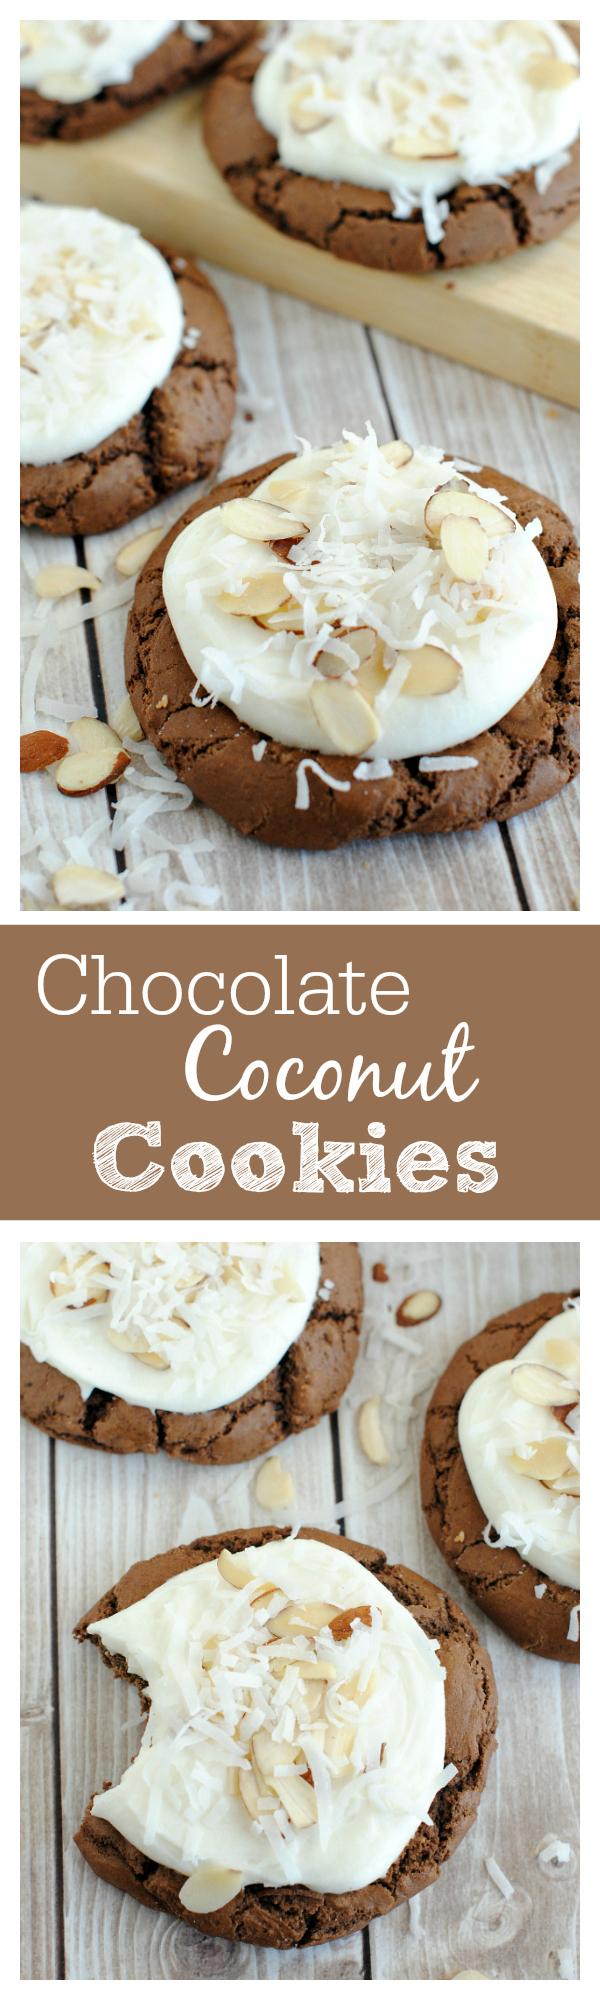 Chocolate Coconut Cookies